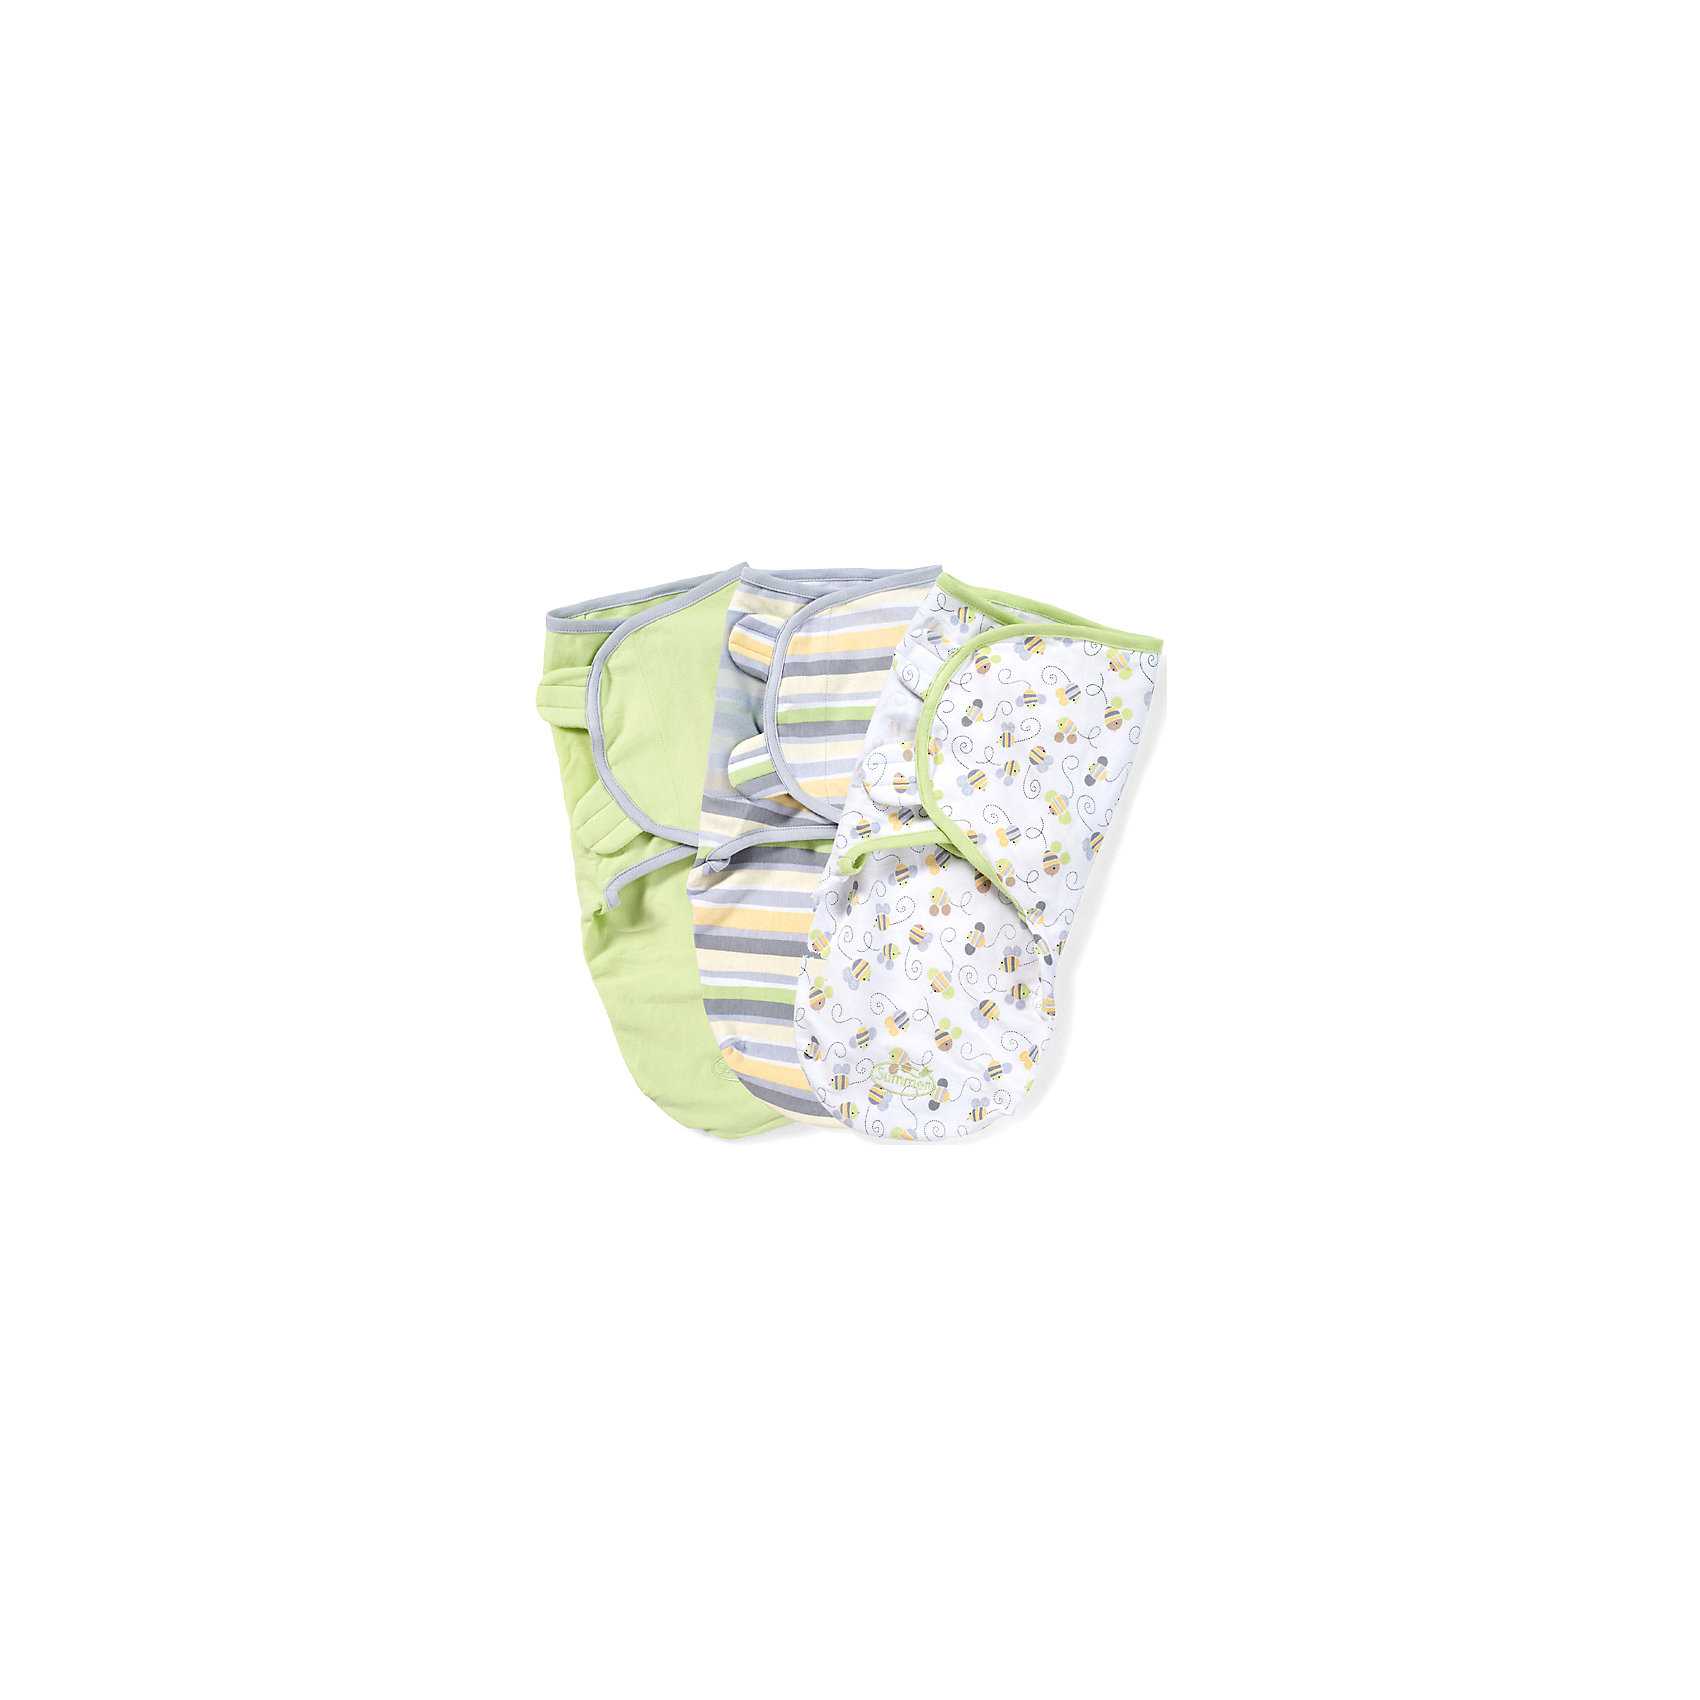 Summer Infant Конверт на липучке SwaddleMe, размер S/M, (3шт), , Summer Infant, нейтральная, пчелки summer infant 54000 конверт swaddleme для пеленания на липучке размер s m 3 шт нейтральная пчелки